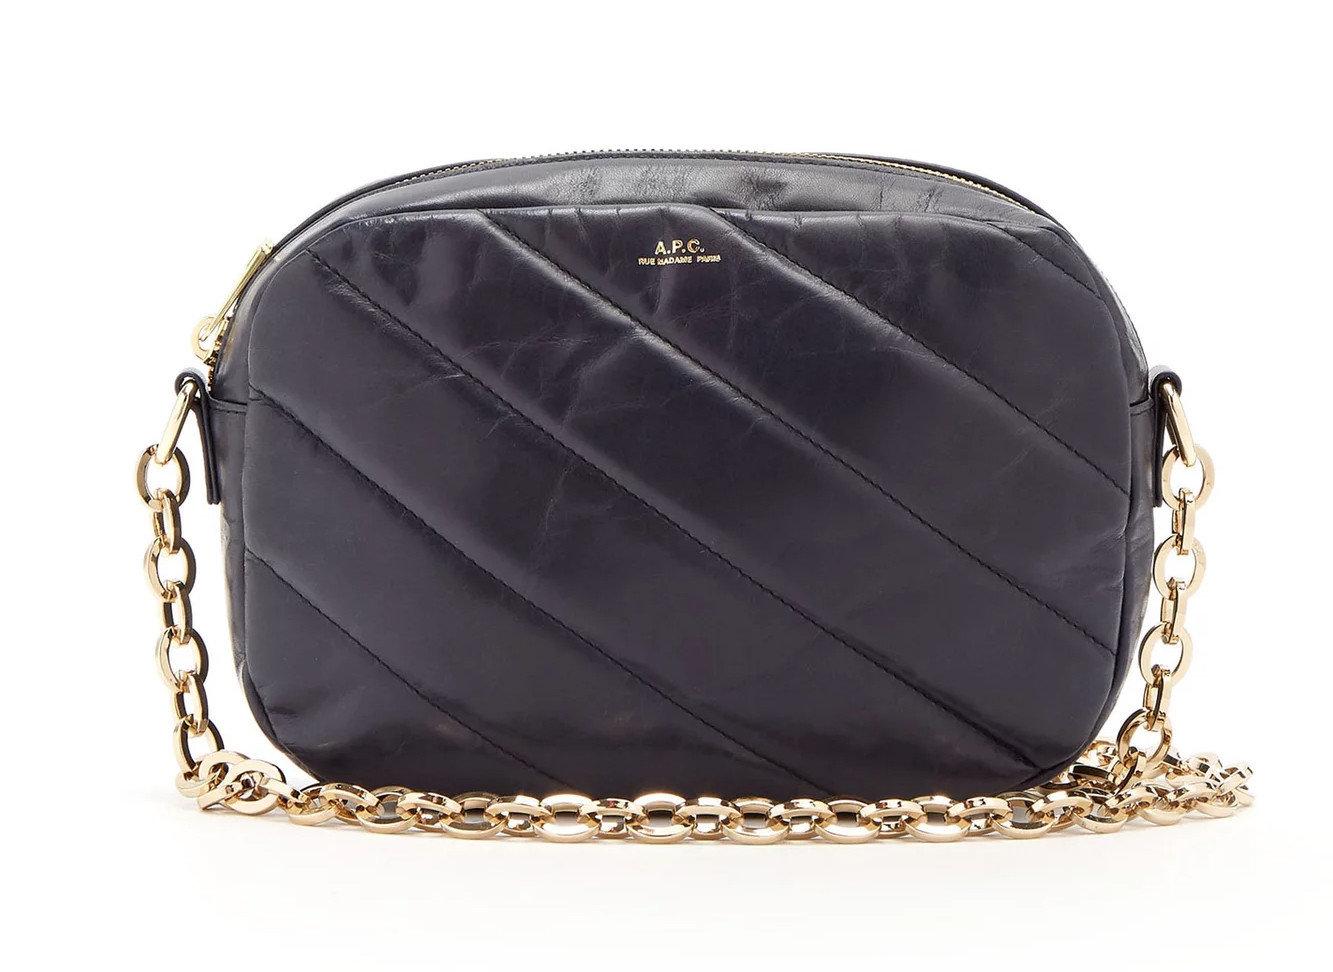 France Style + Design Travel Shop bag handbag shoulder bag leather product chain strap coin purse pattern